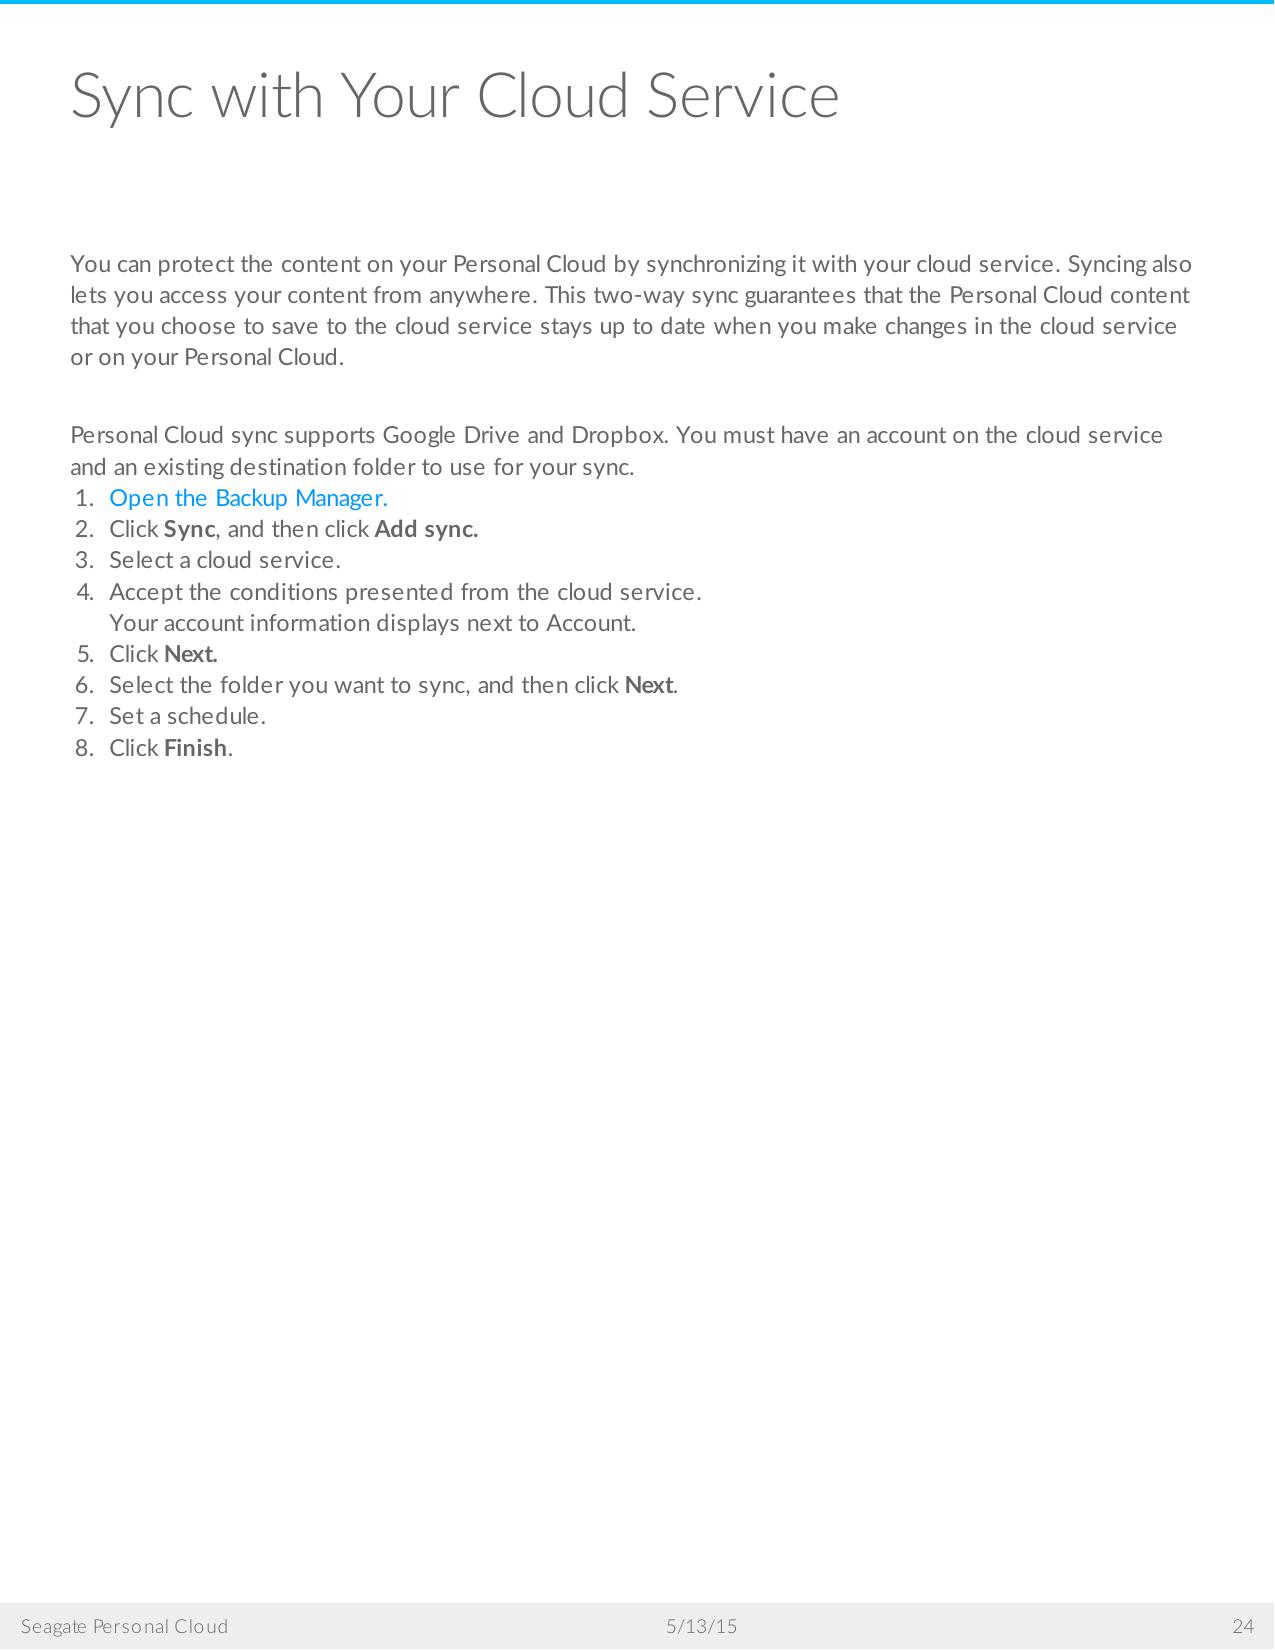 Seagate SRN21C Personal Cloud User Manual To The B292394b